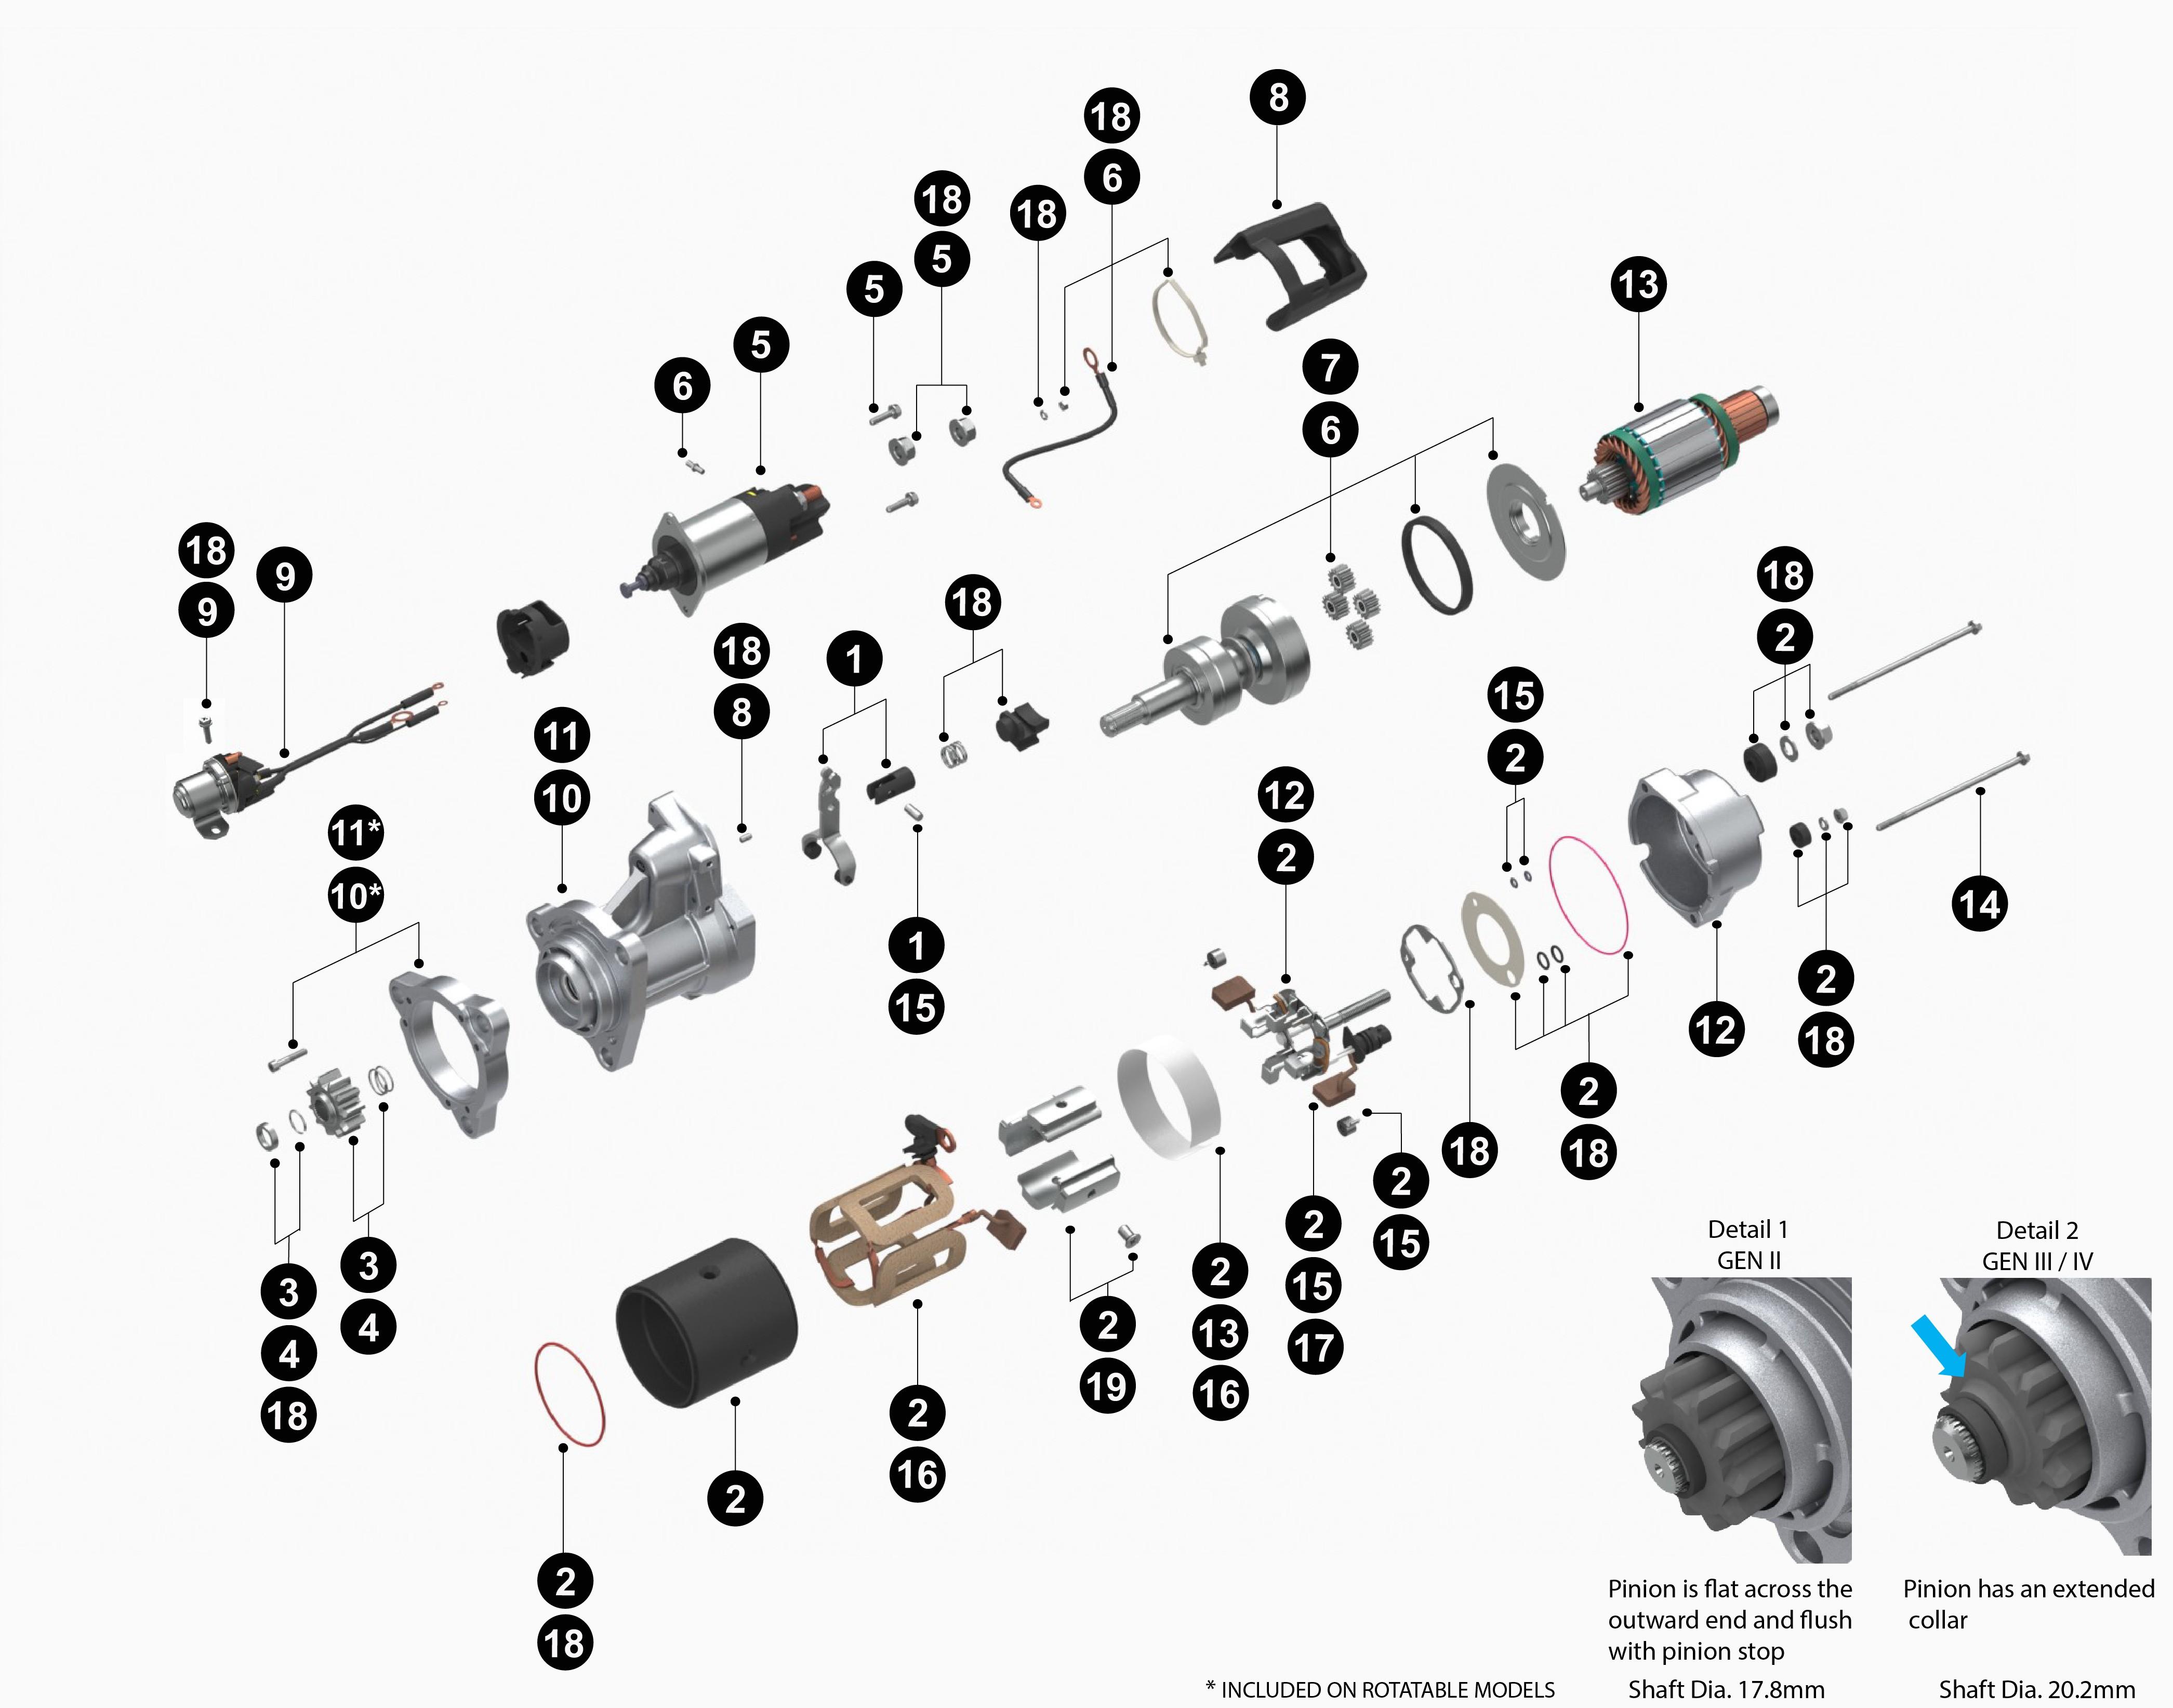 Cummins Isx Engine Diagram Ecm Wiring M11 12v 39mt Starter Oem Delco Replaces We Of